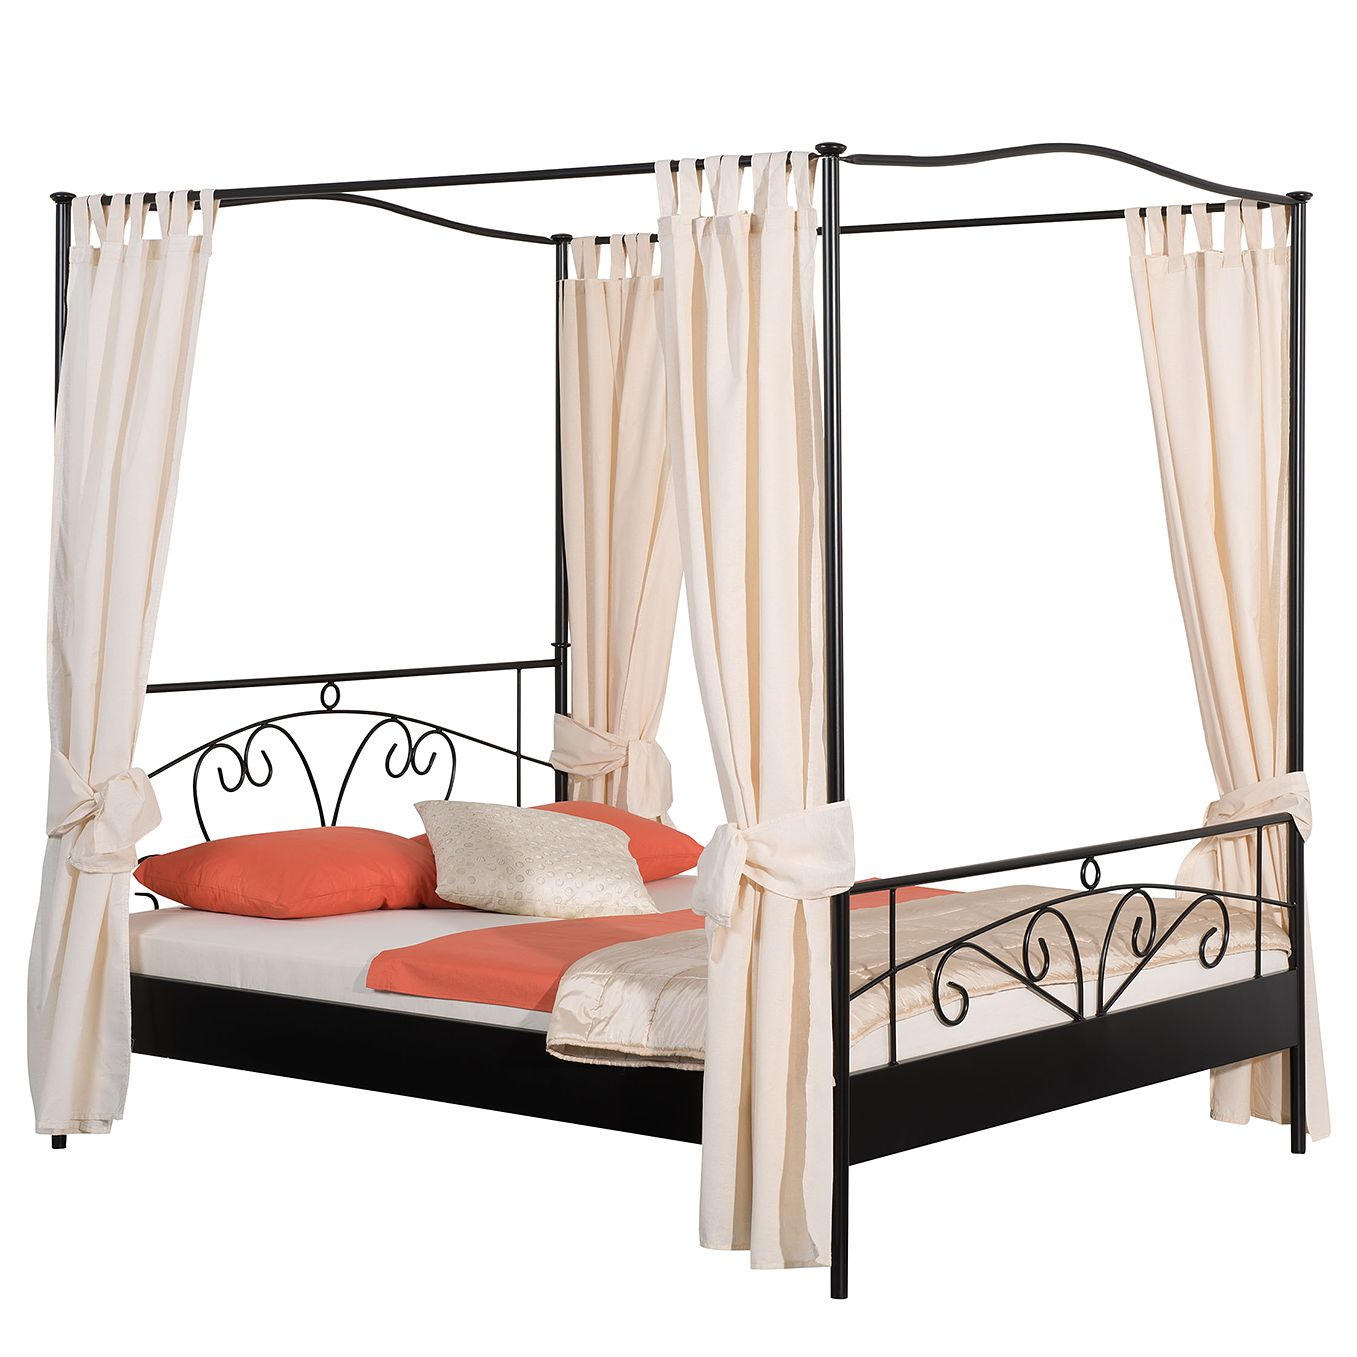 Home24 Himmelbett Olbia In 2019 Betten Home Decor Bed